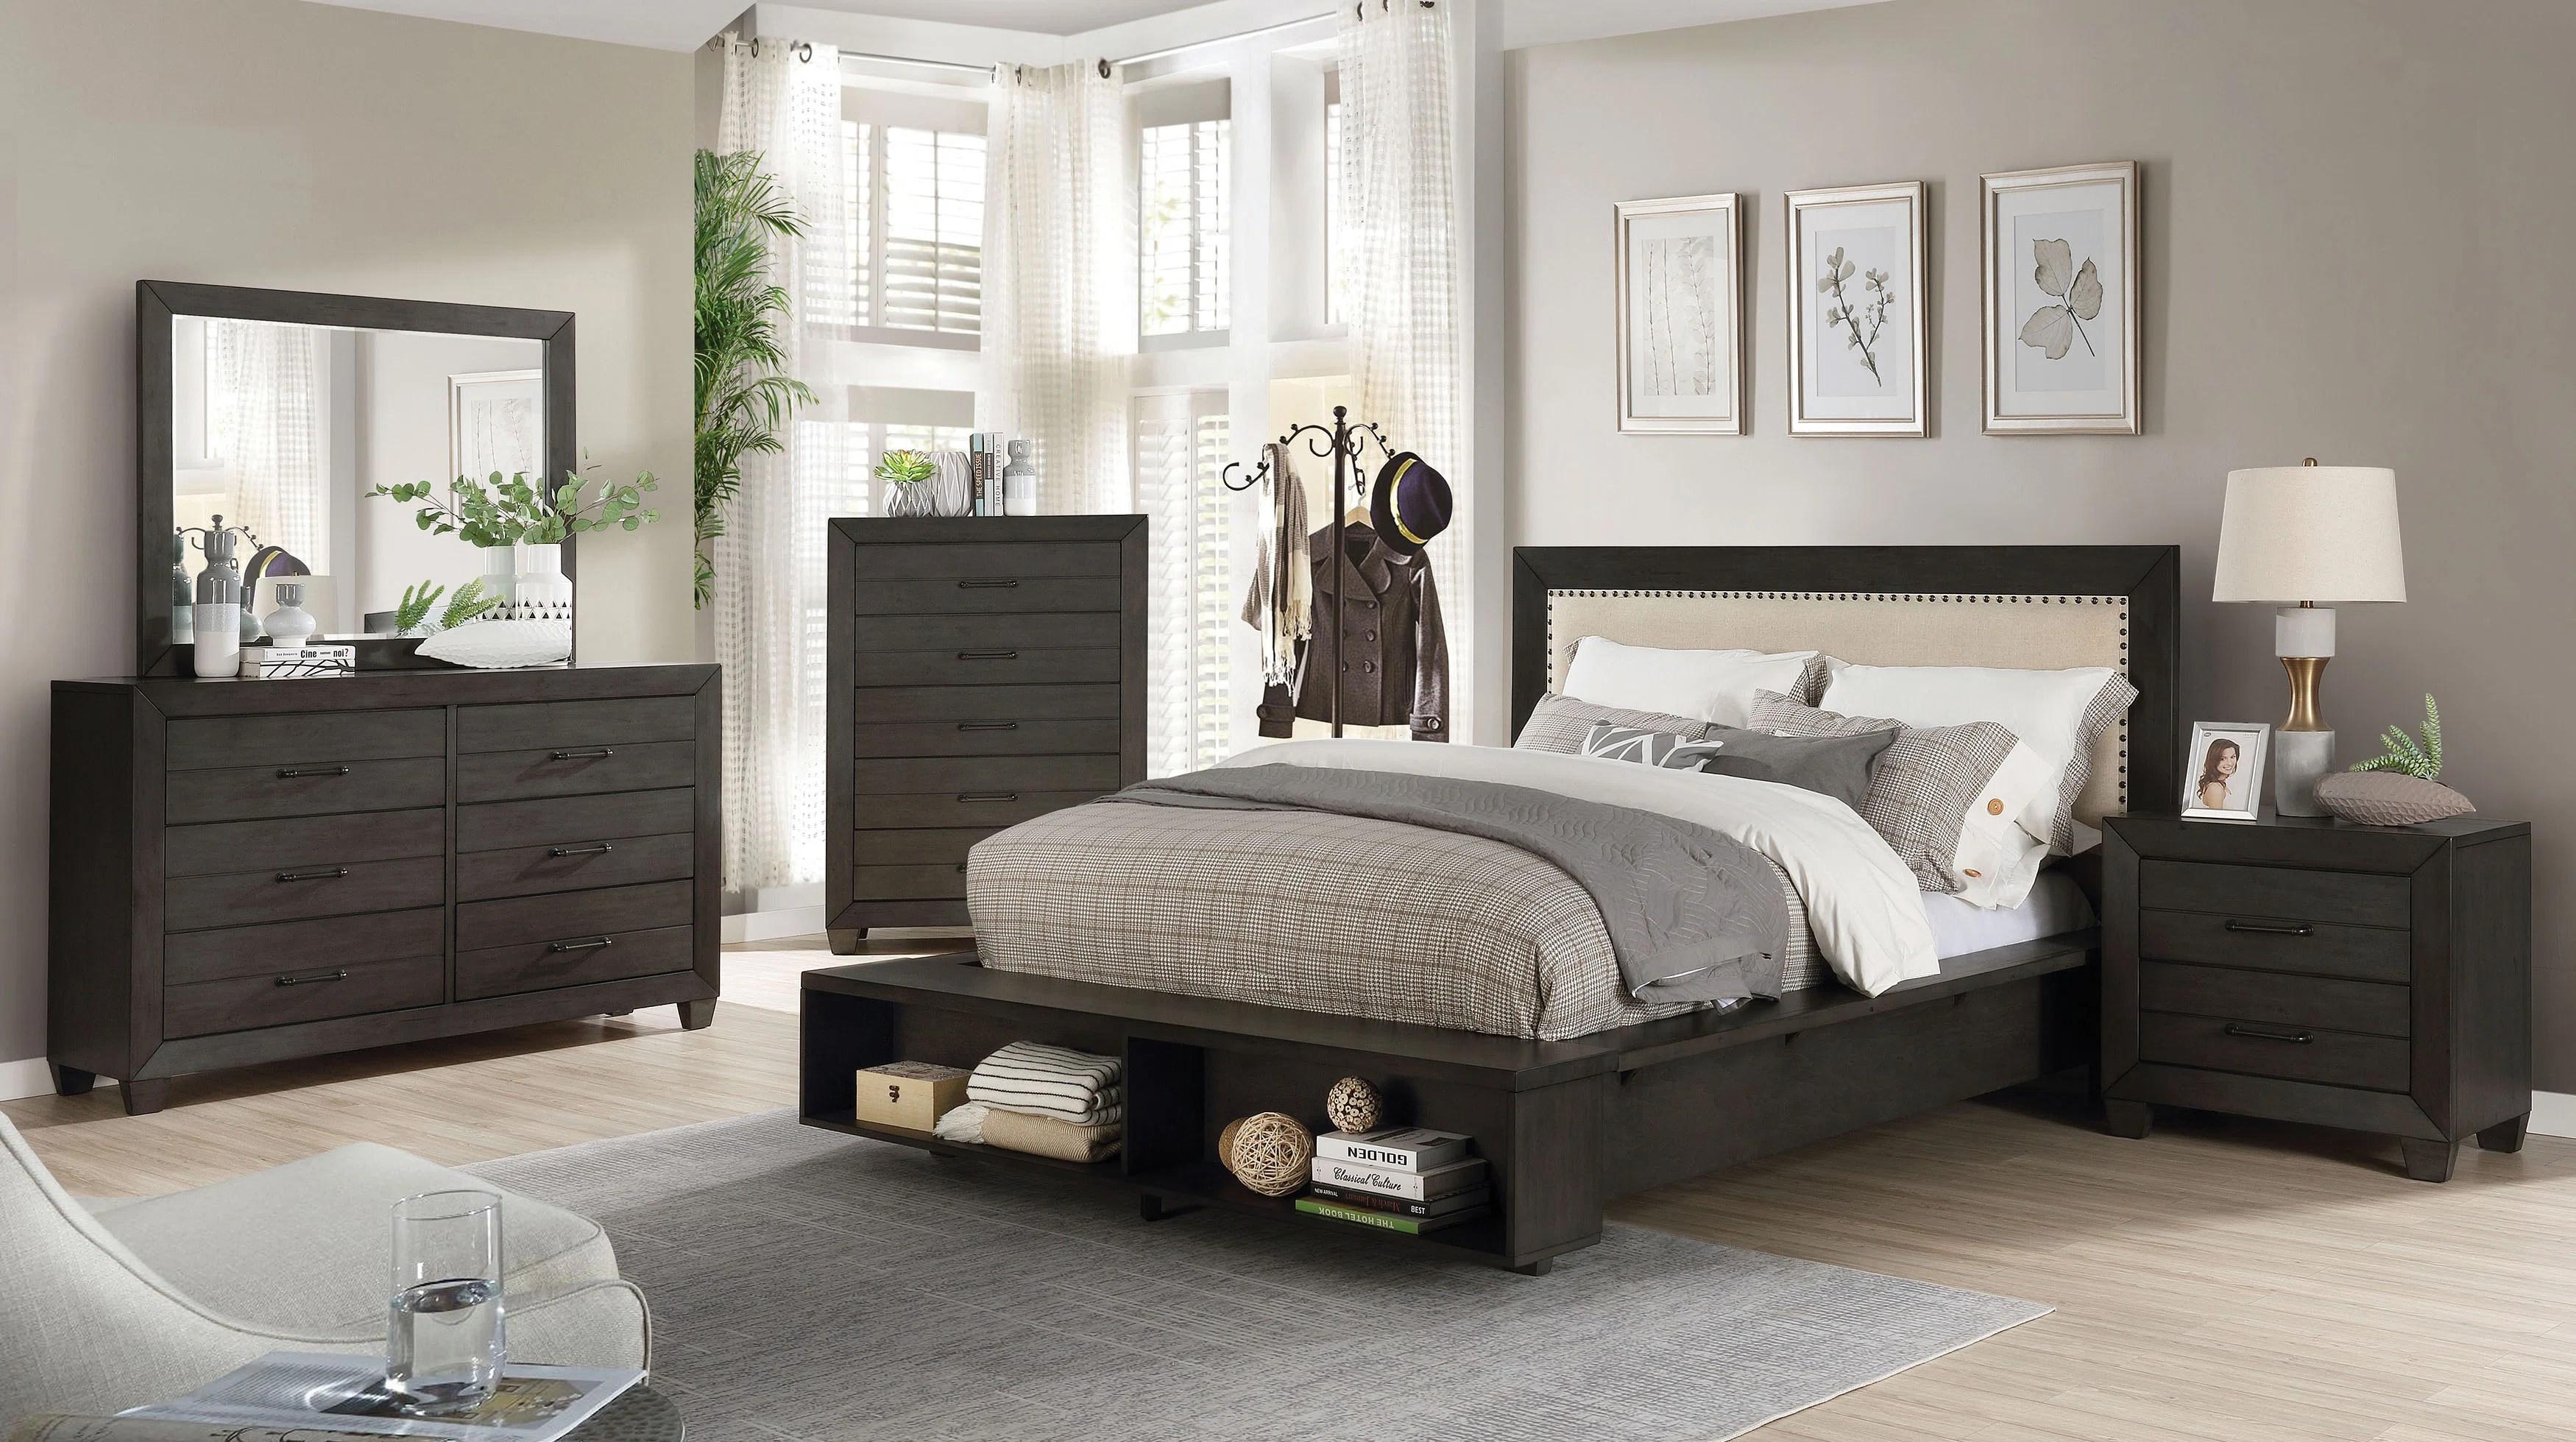 dussault storage platform configurable bedroom set